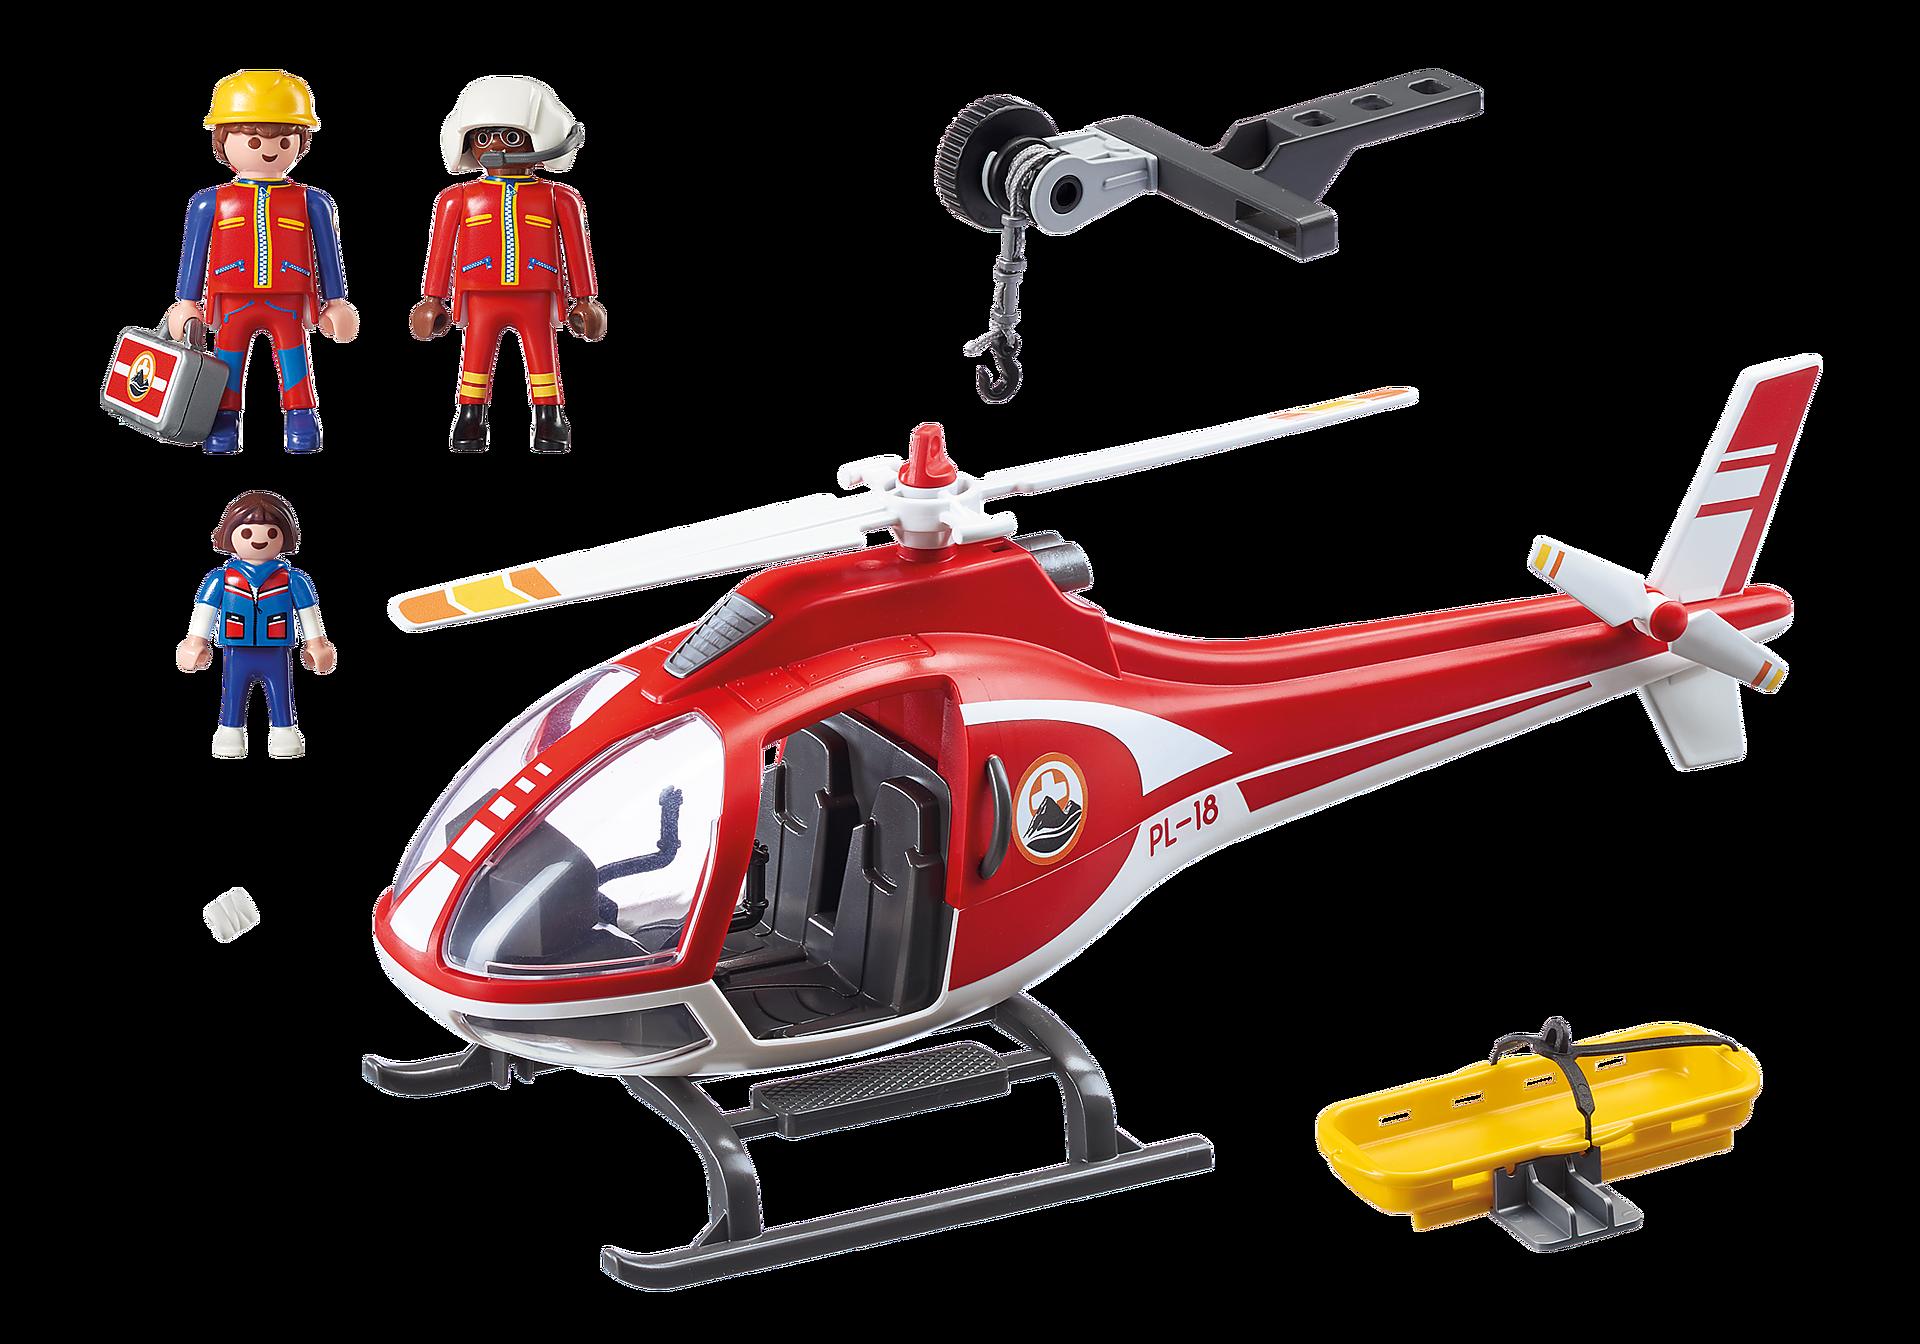 http://media.playmobil.com/i/playmobil/9127_product_box_back/Reddingswerkers met helikopter